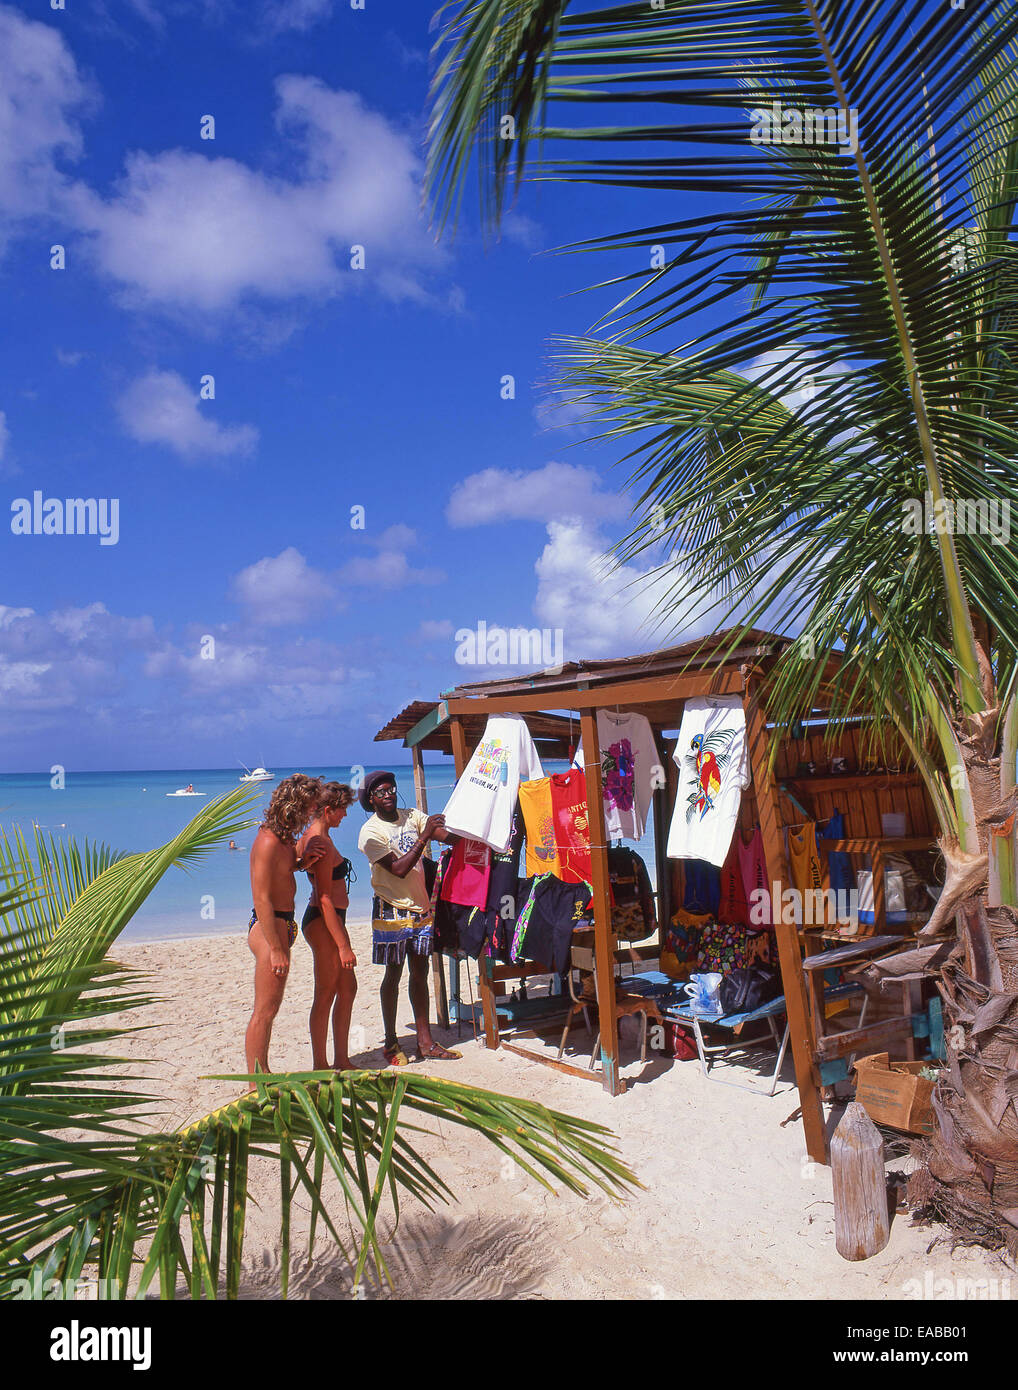 Couple at beach stall, Jolly Beach, Saint Mary's Parish, Antigua, Antigua and Barbuda, Lesser Antilles, Caribbean - Stock Image